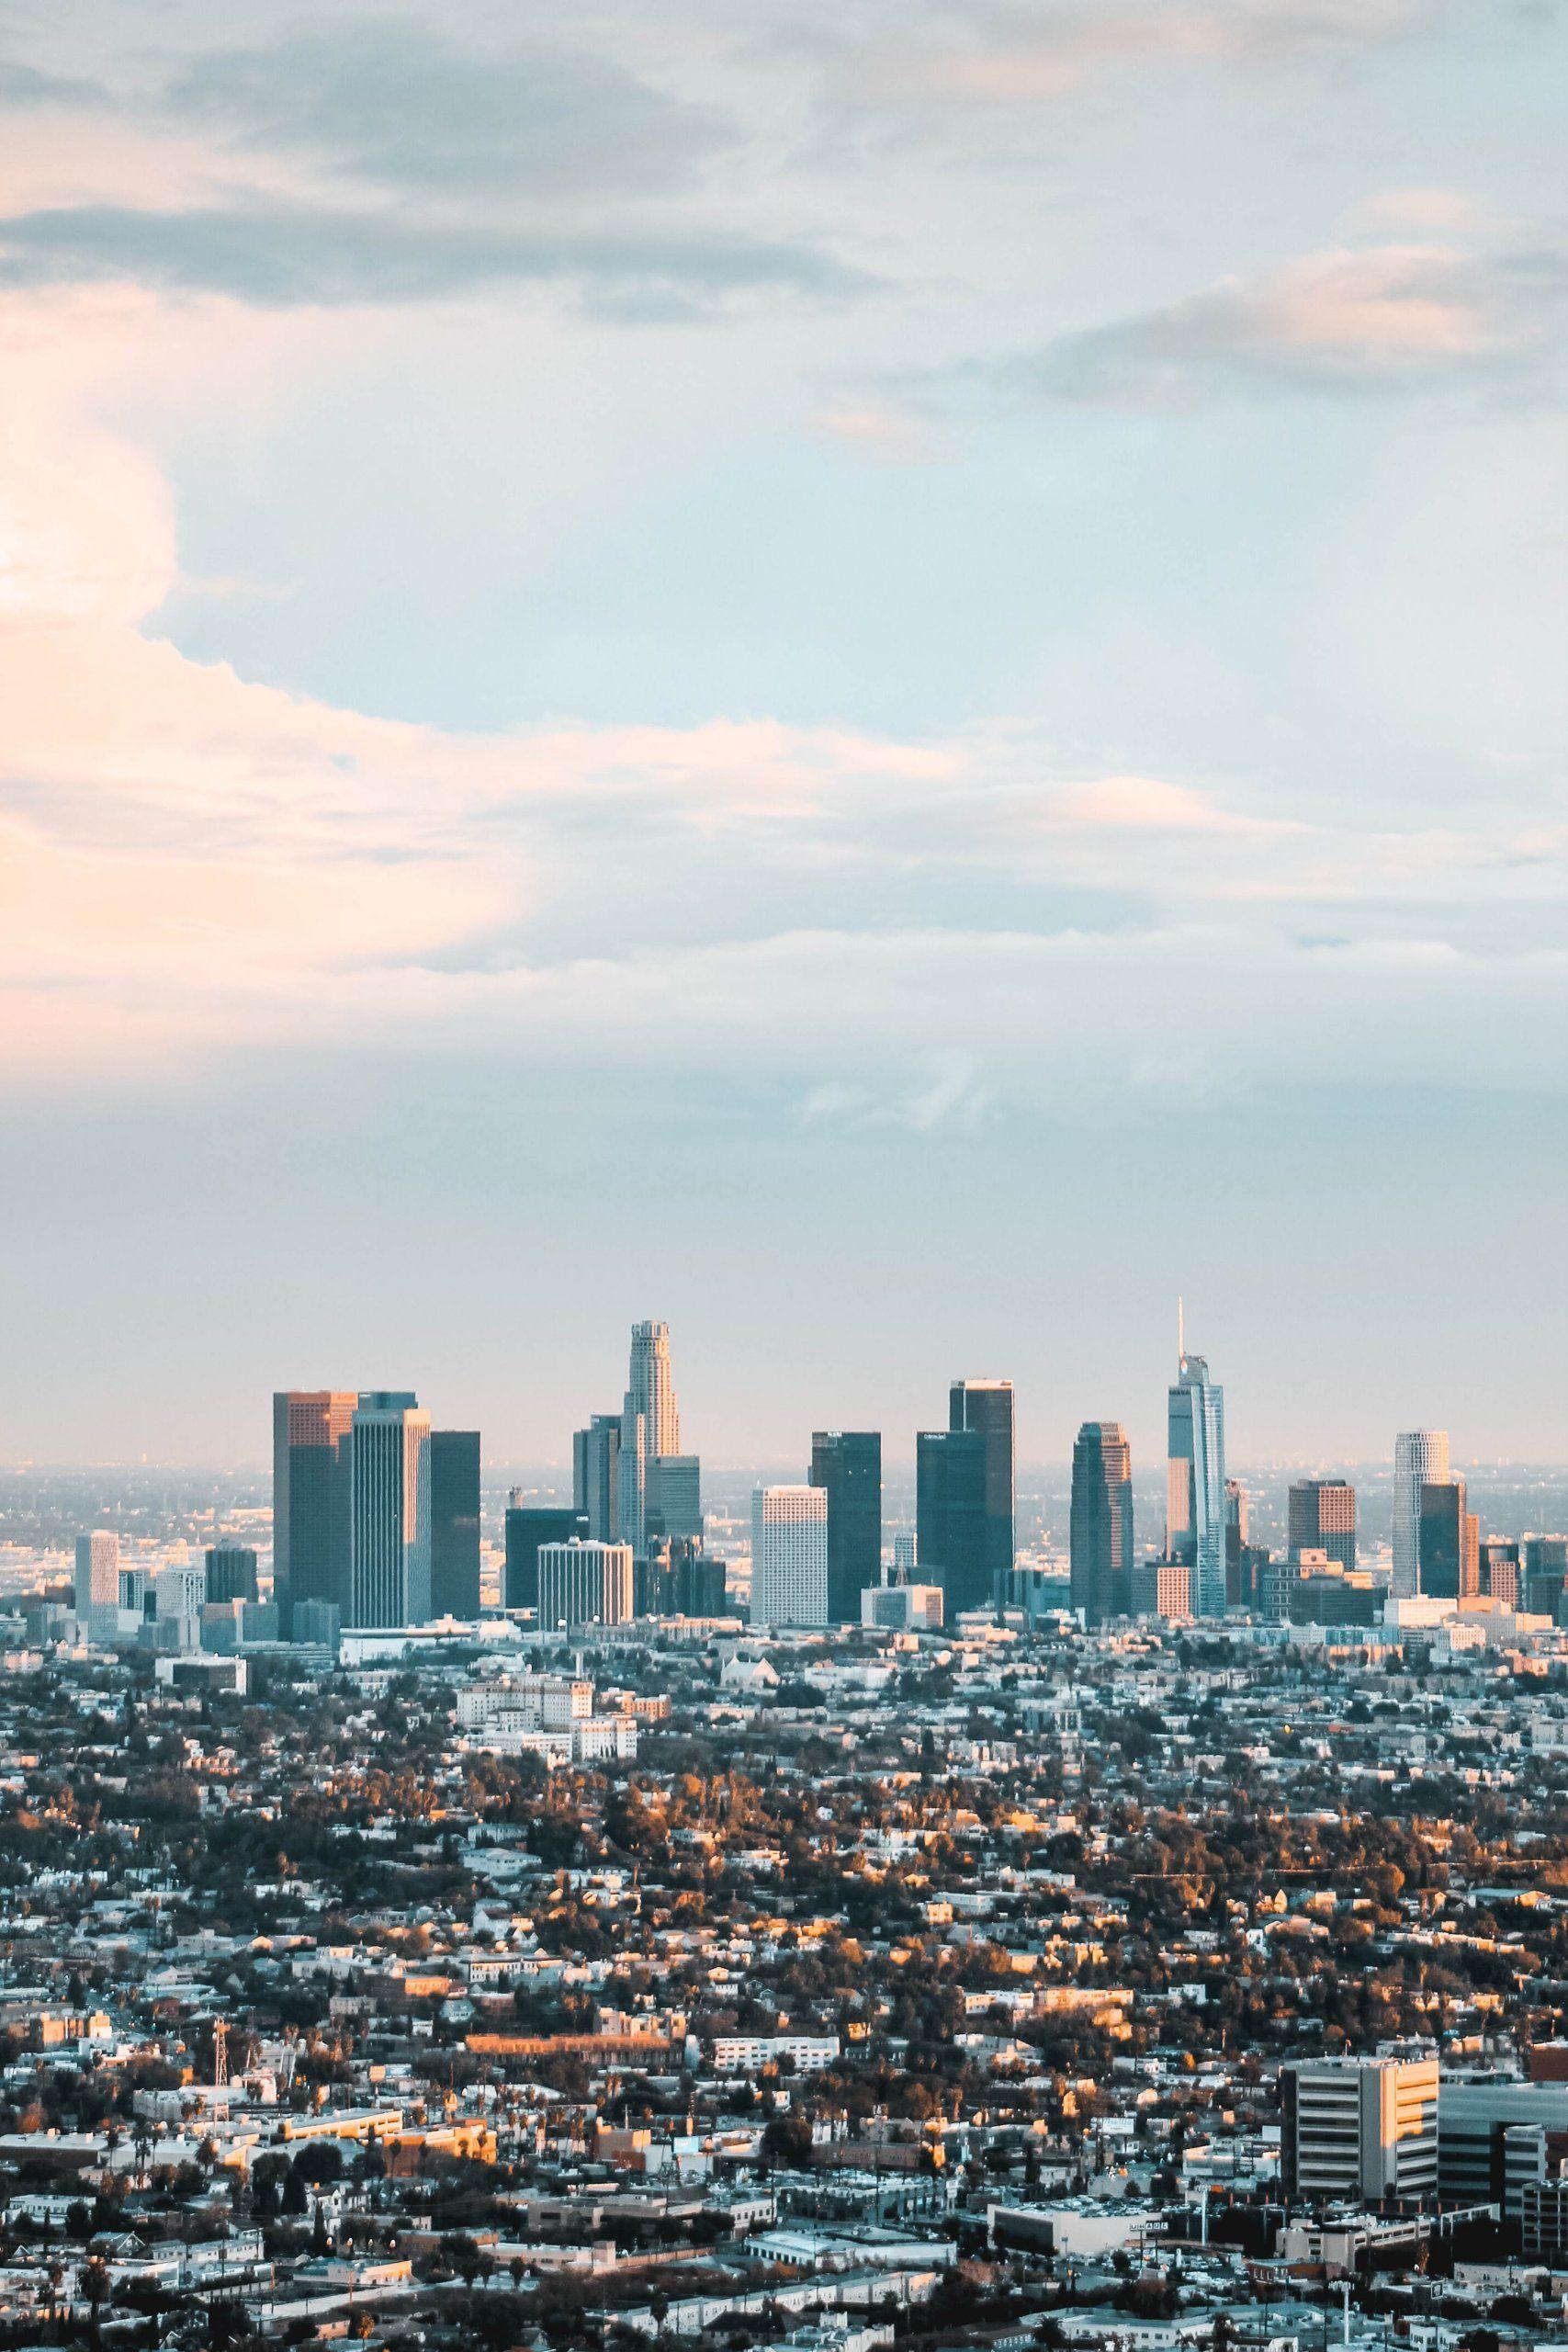 Regions Of La County Los Angeles County Economic Development Corporation Los Angeles Map Los Angeles County California Map